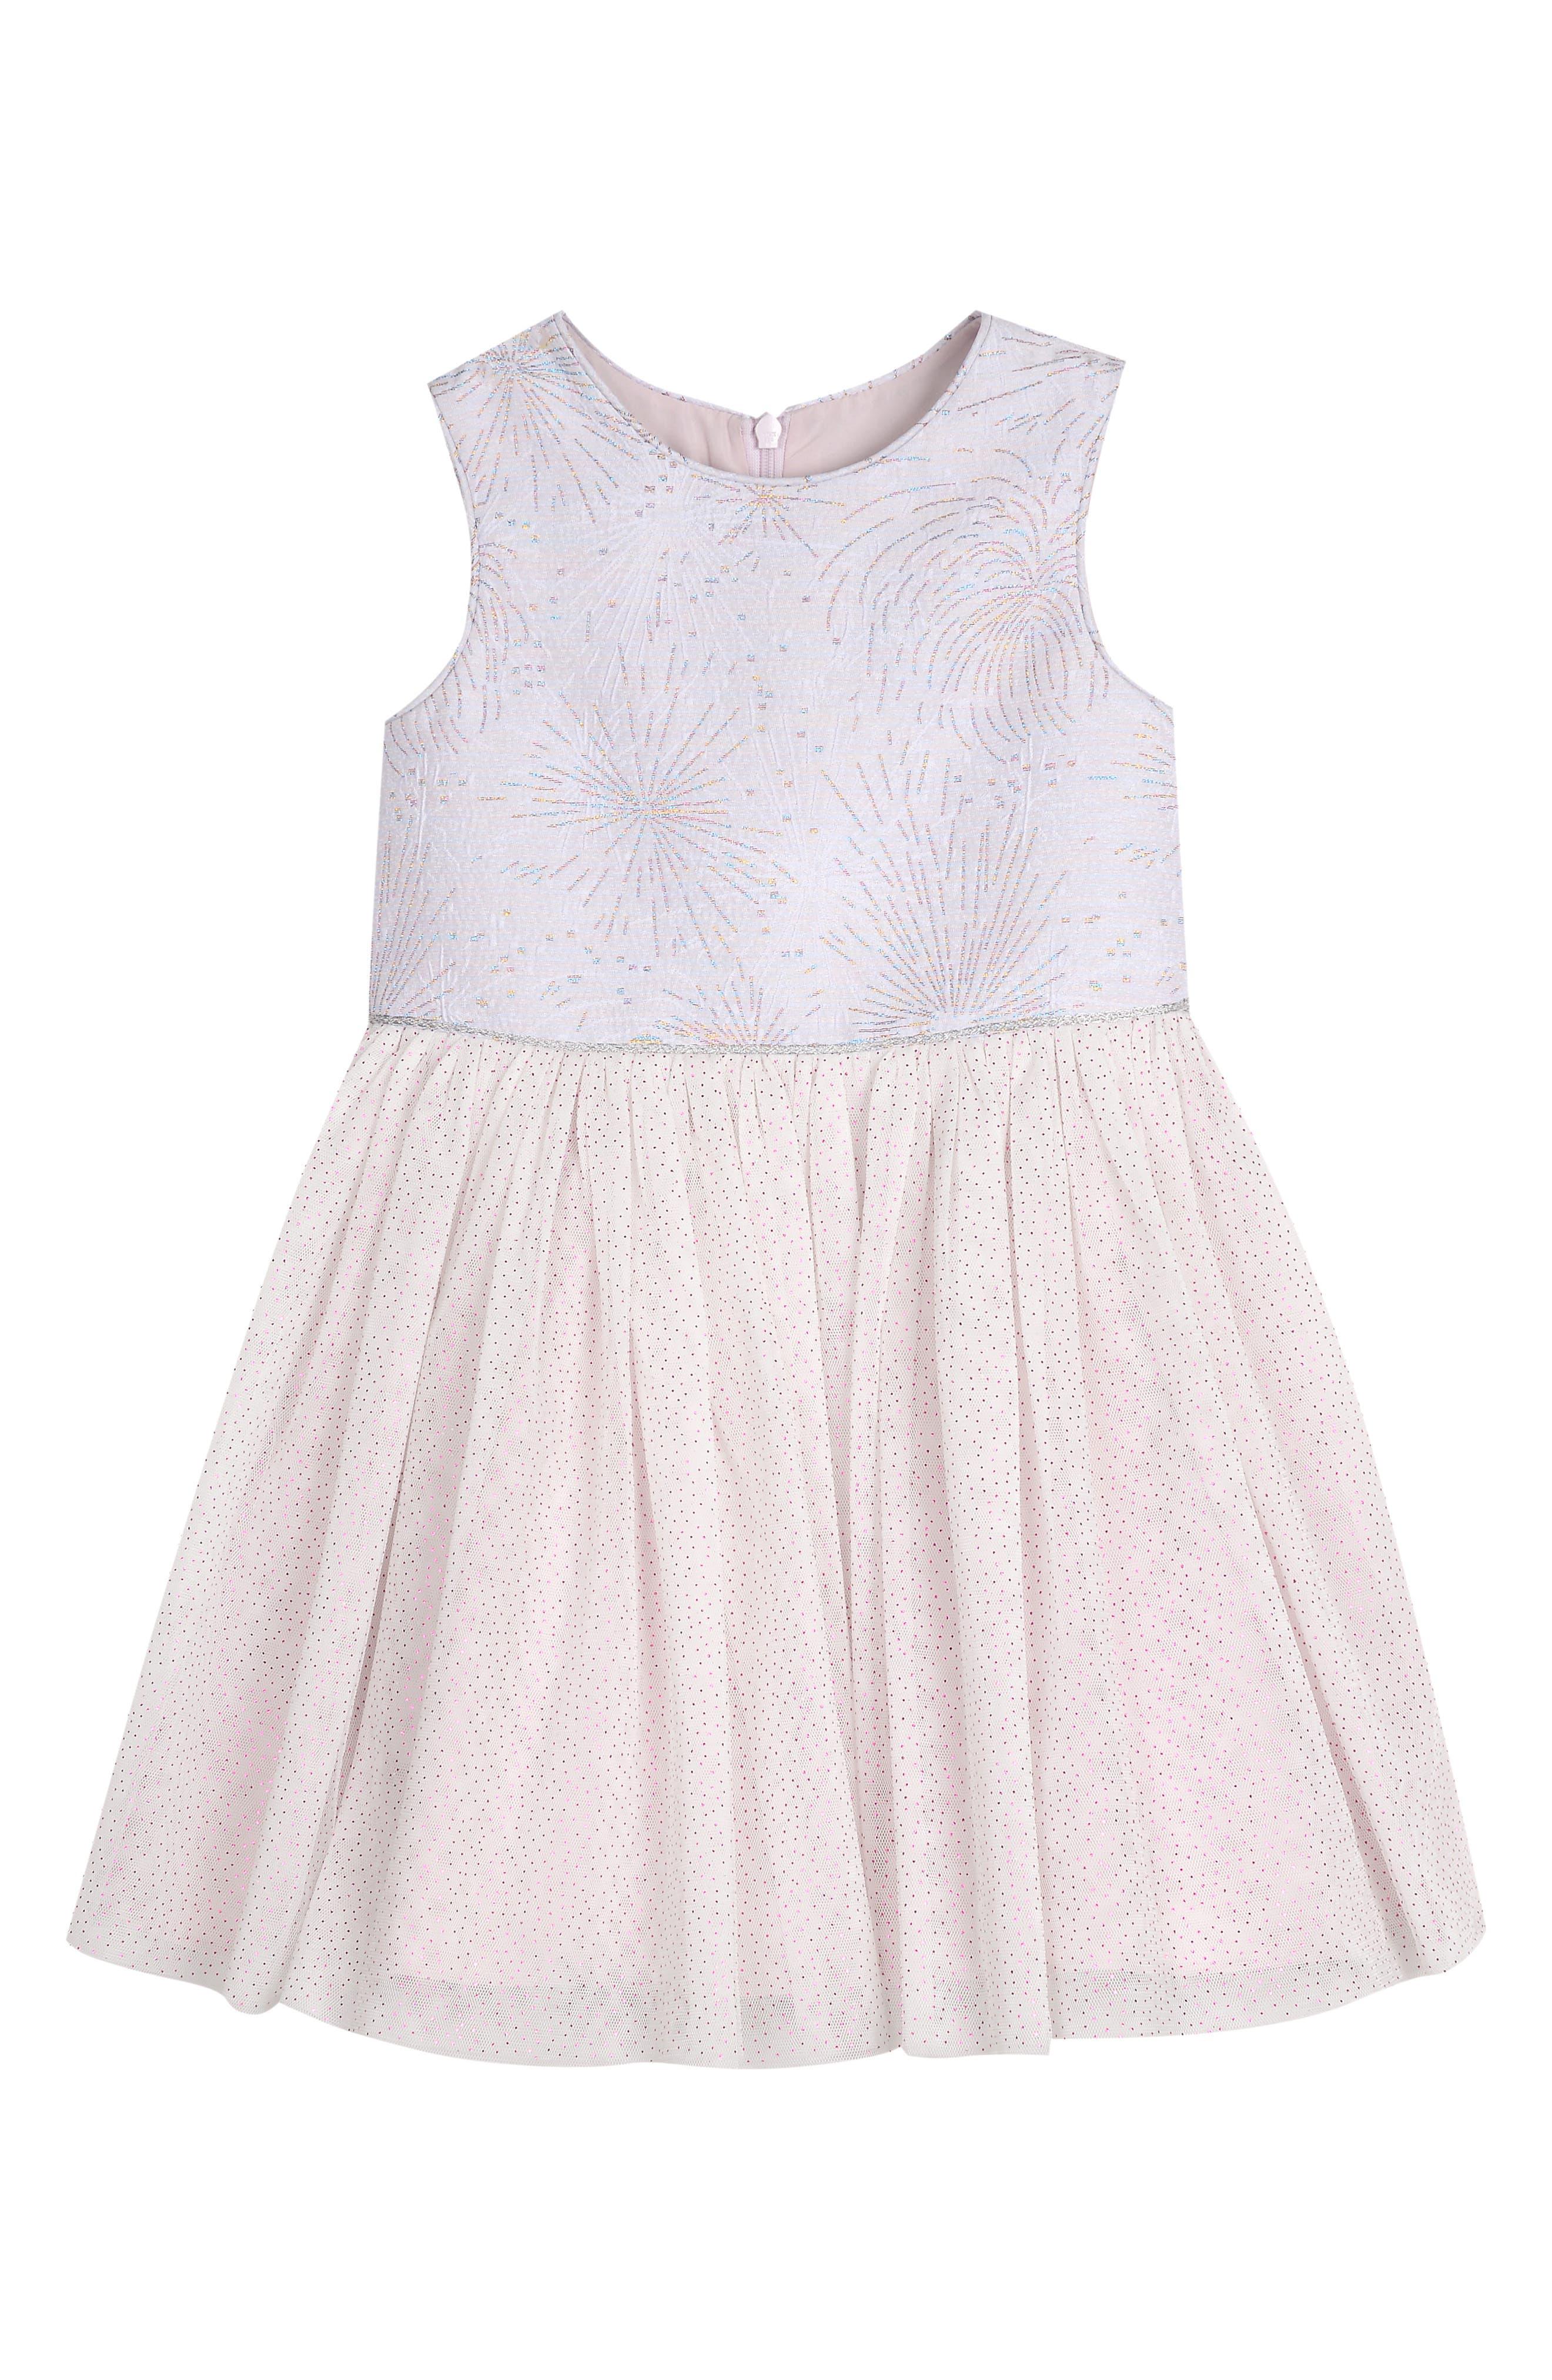 PIPPA & JULIE Glitter Fireworks Tulle Dress, Main, color, WHITE